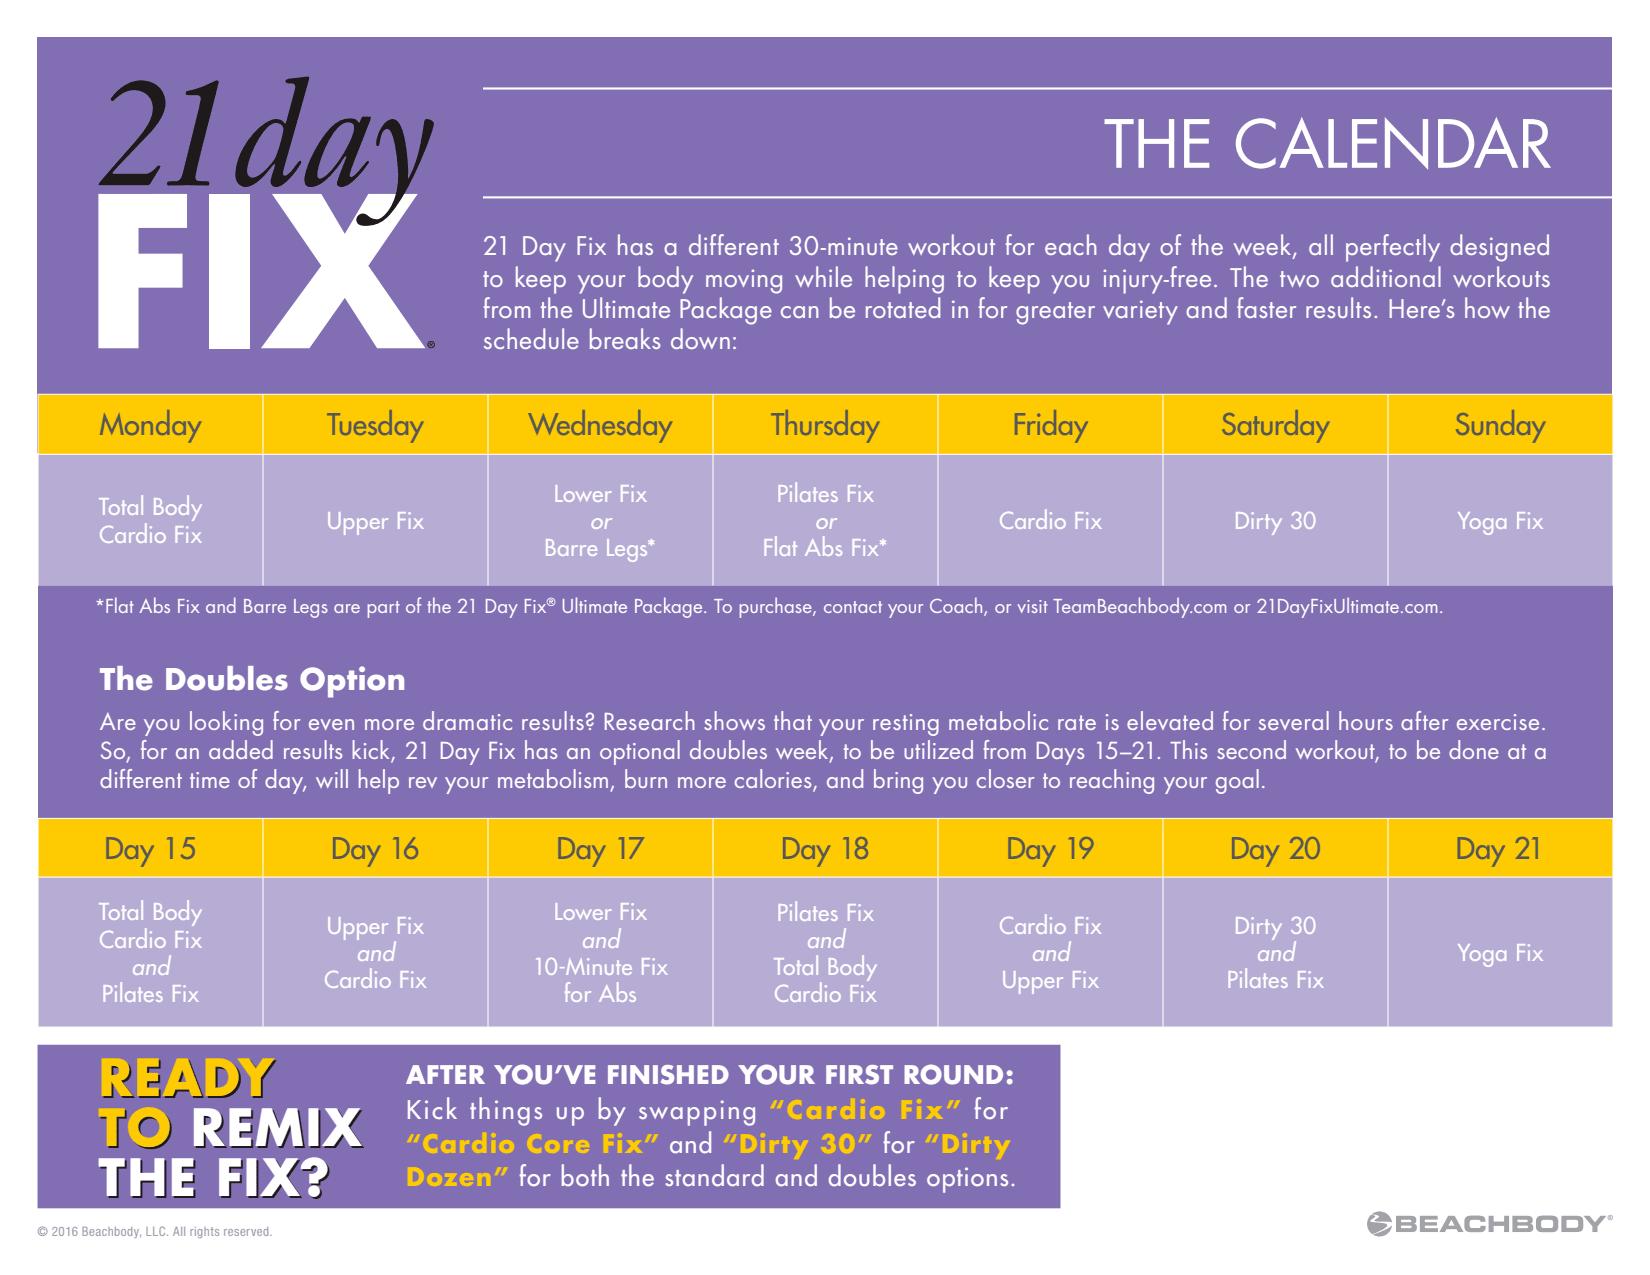 21 Day Fix Workout Schedule